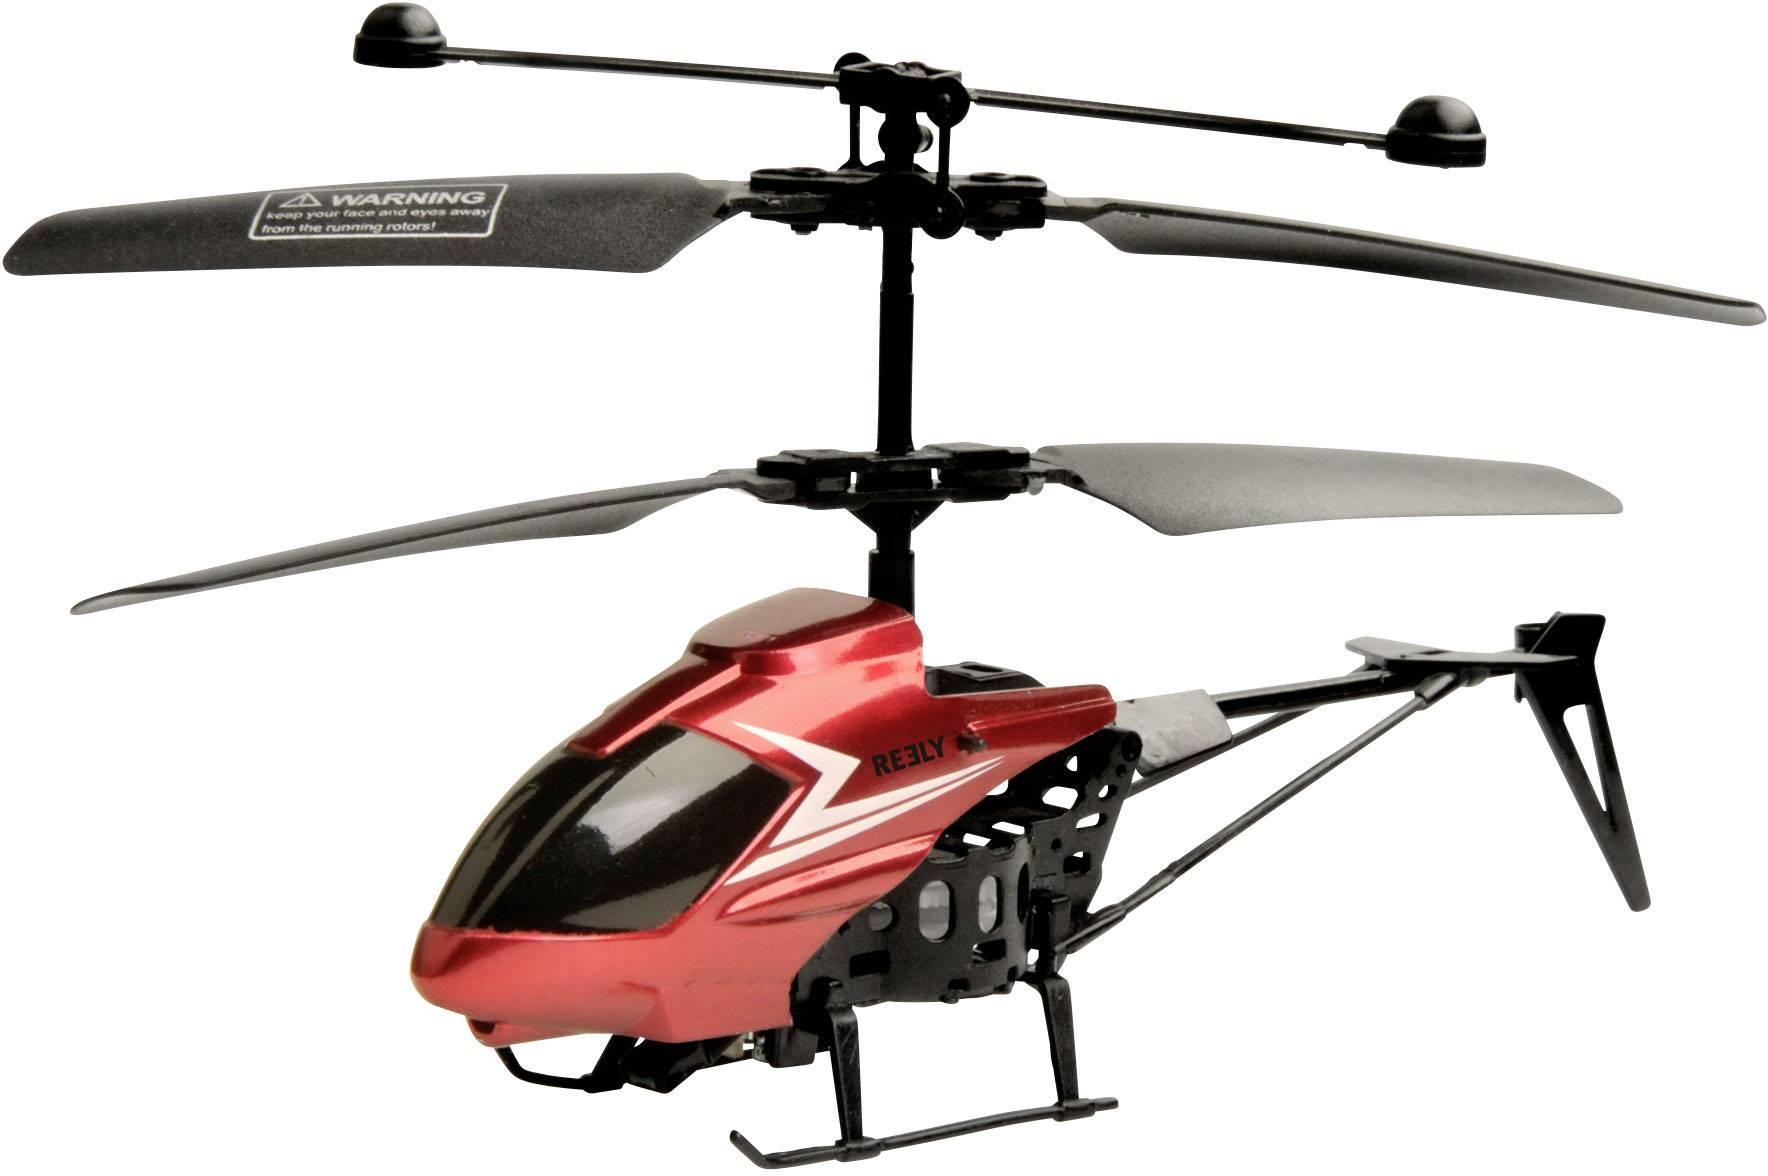 RC vrtuľník Reely 2 kanaler, RtF